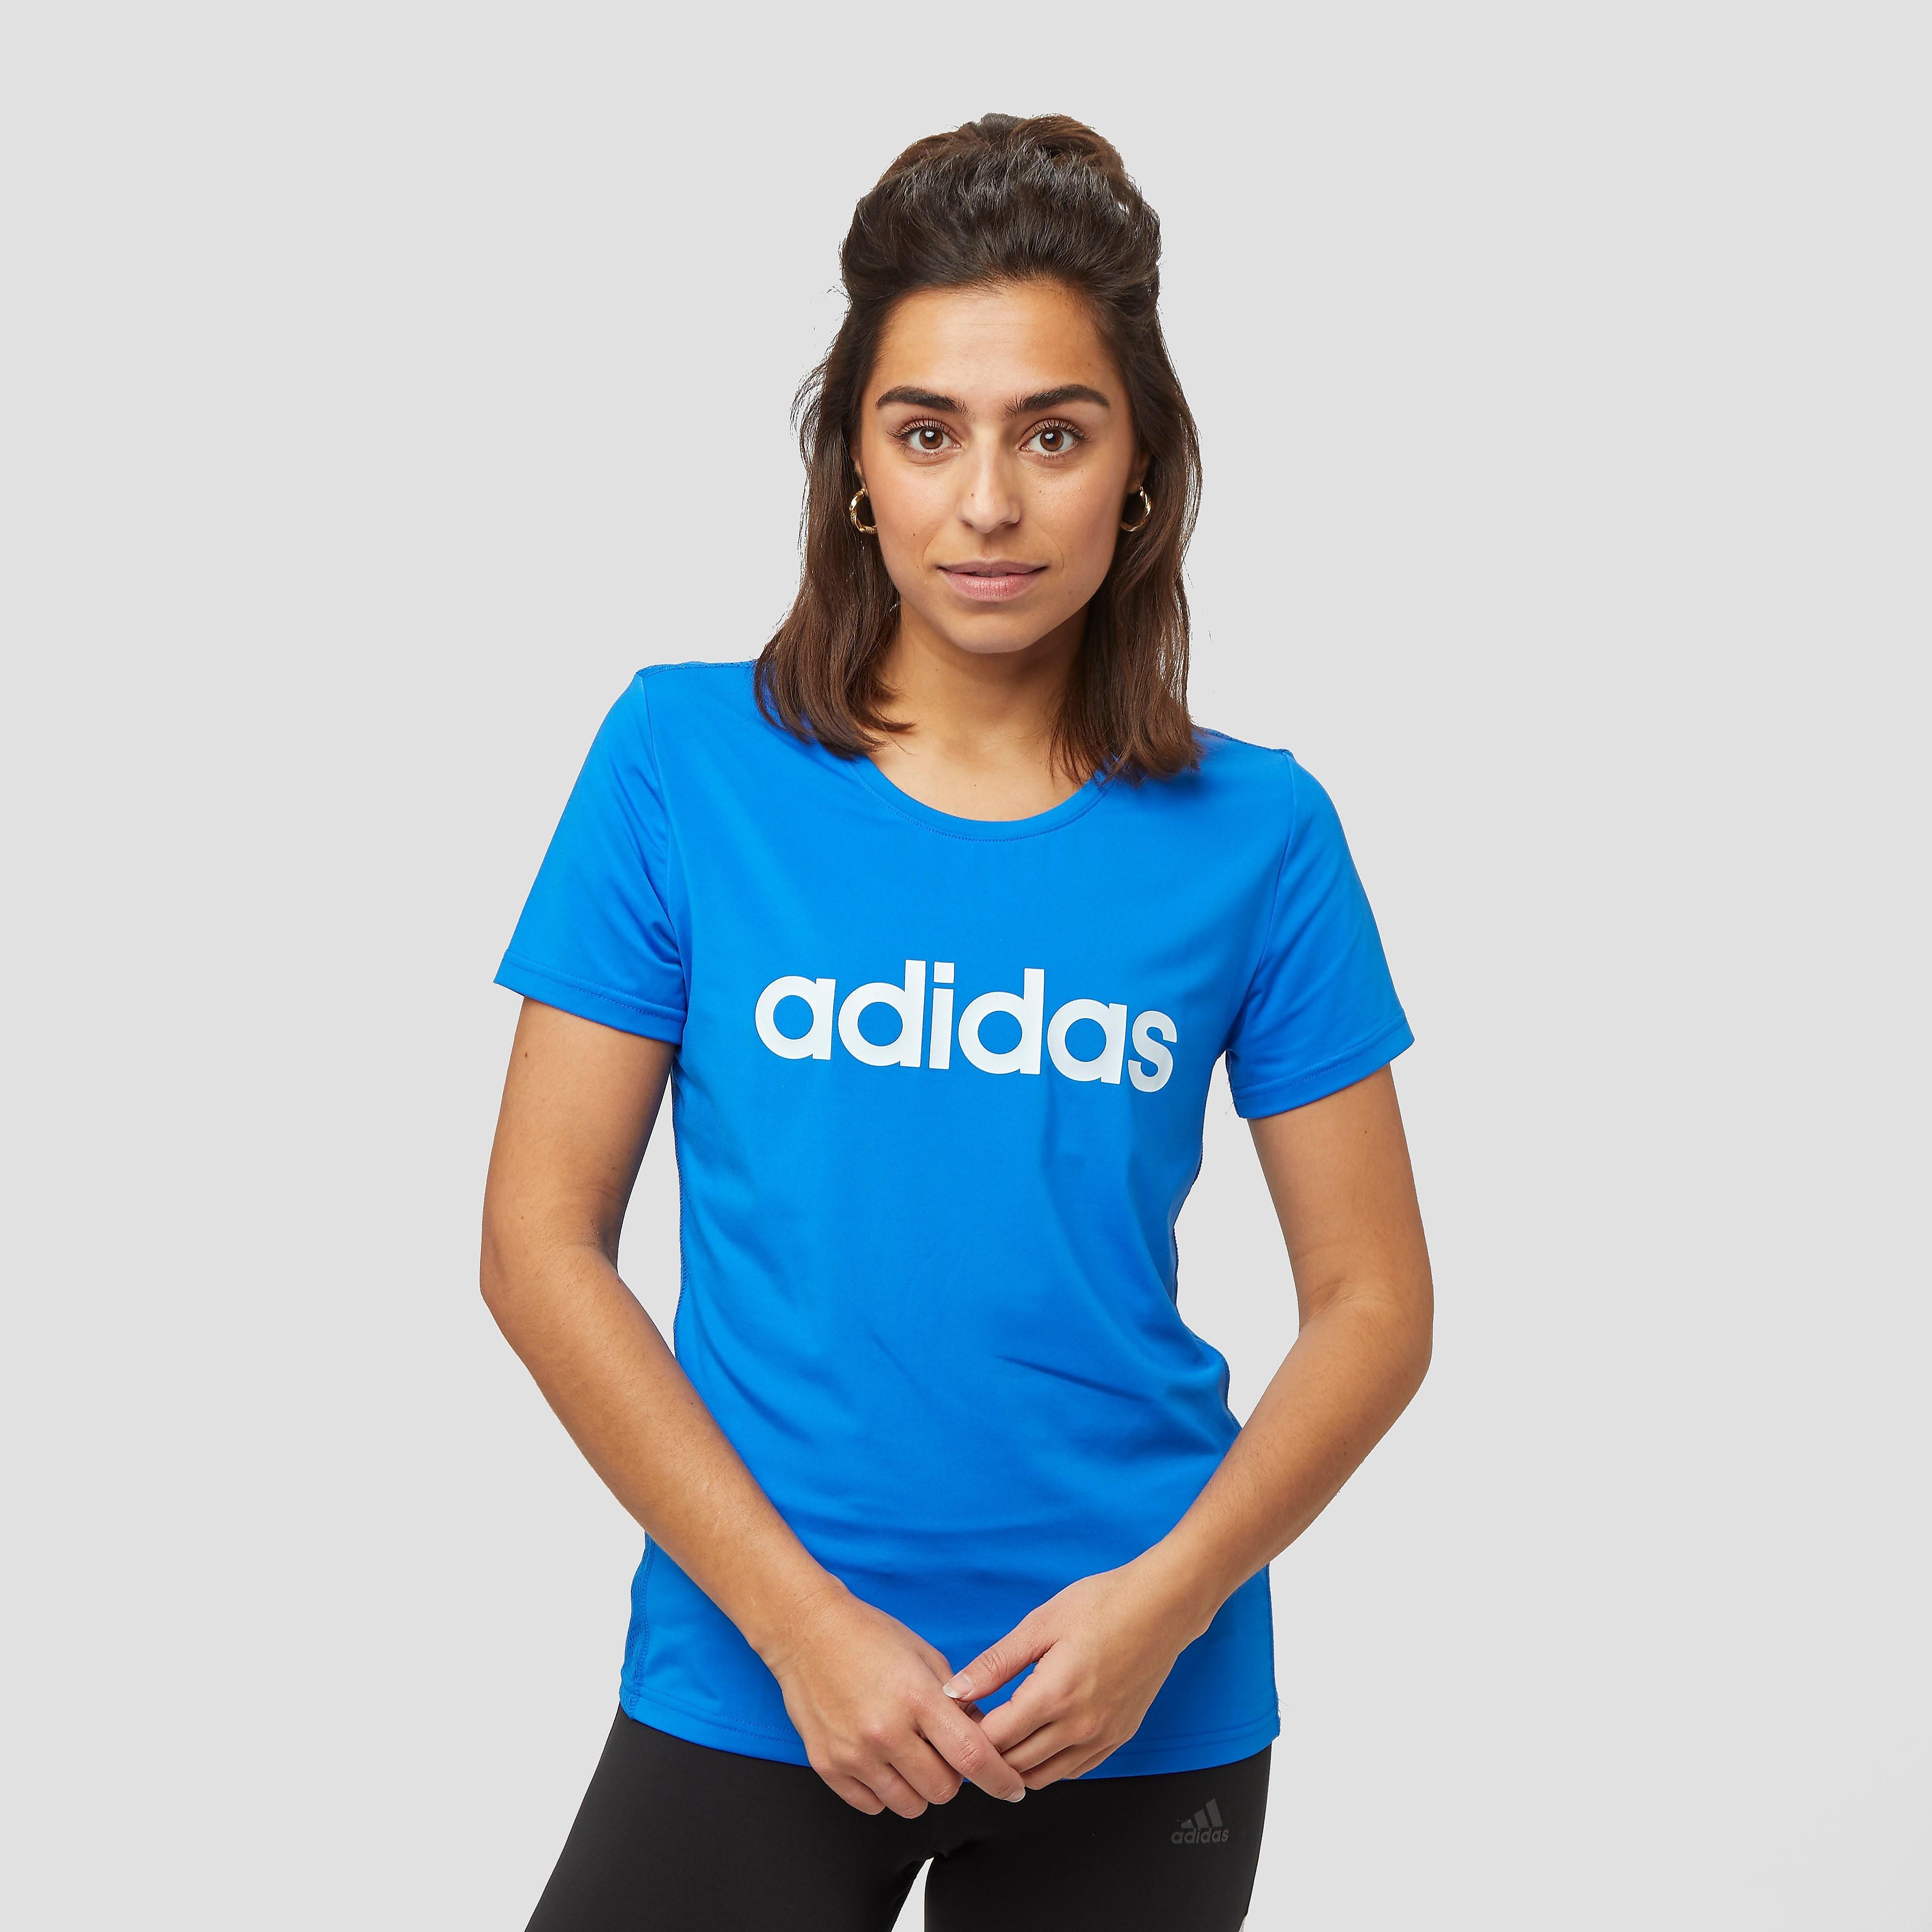 adidas Design 2 move hardloopshirt blauw dames Dames